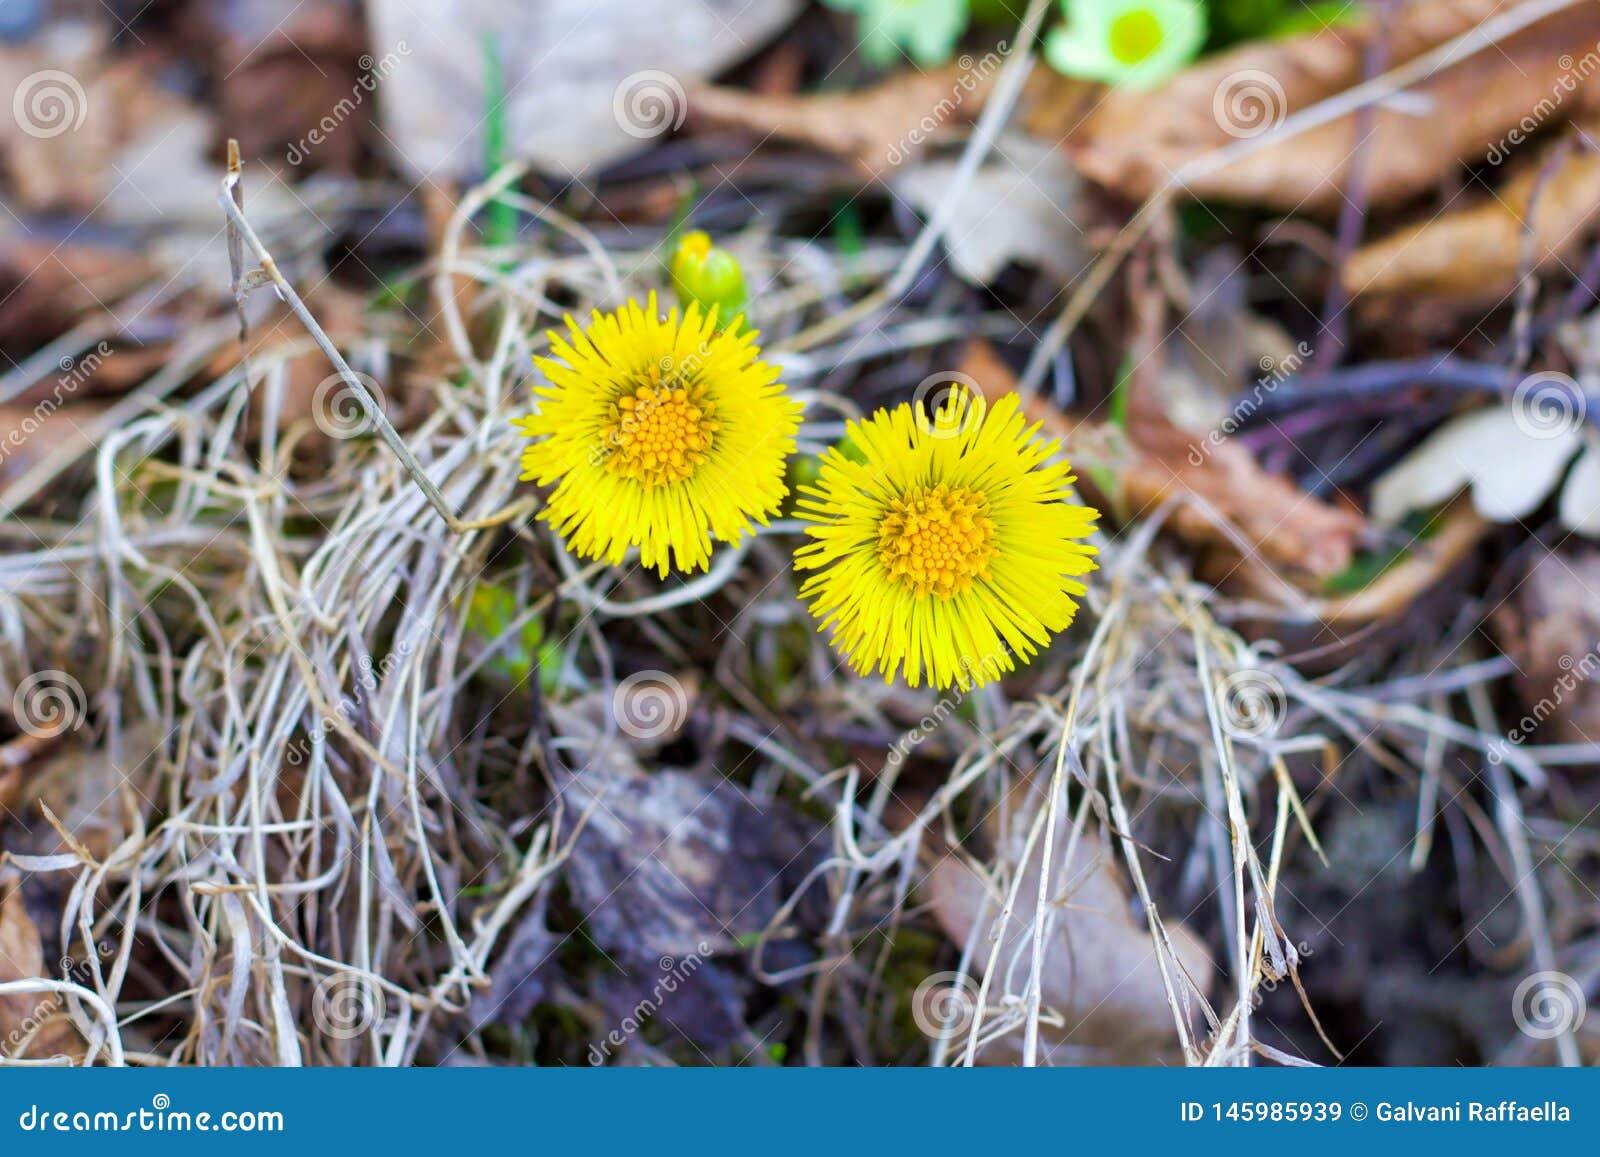 Twee gele madeliefjes in bloei onder droge bladeren